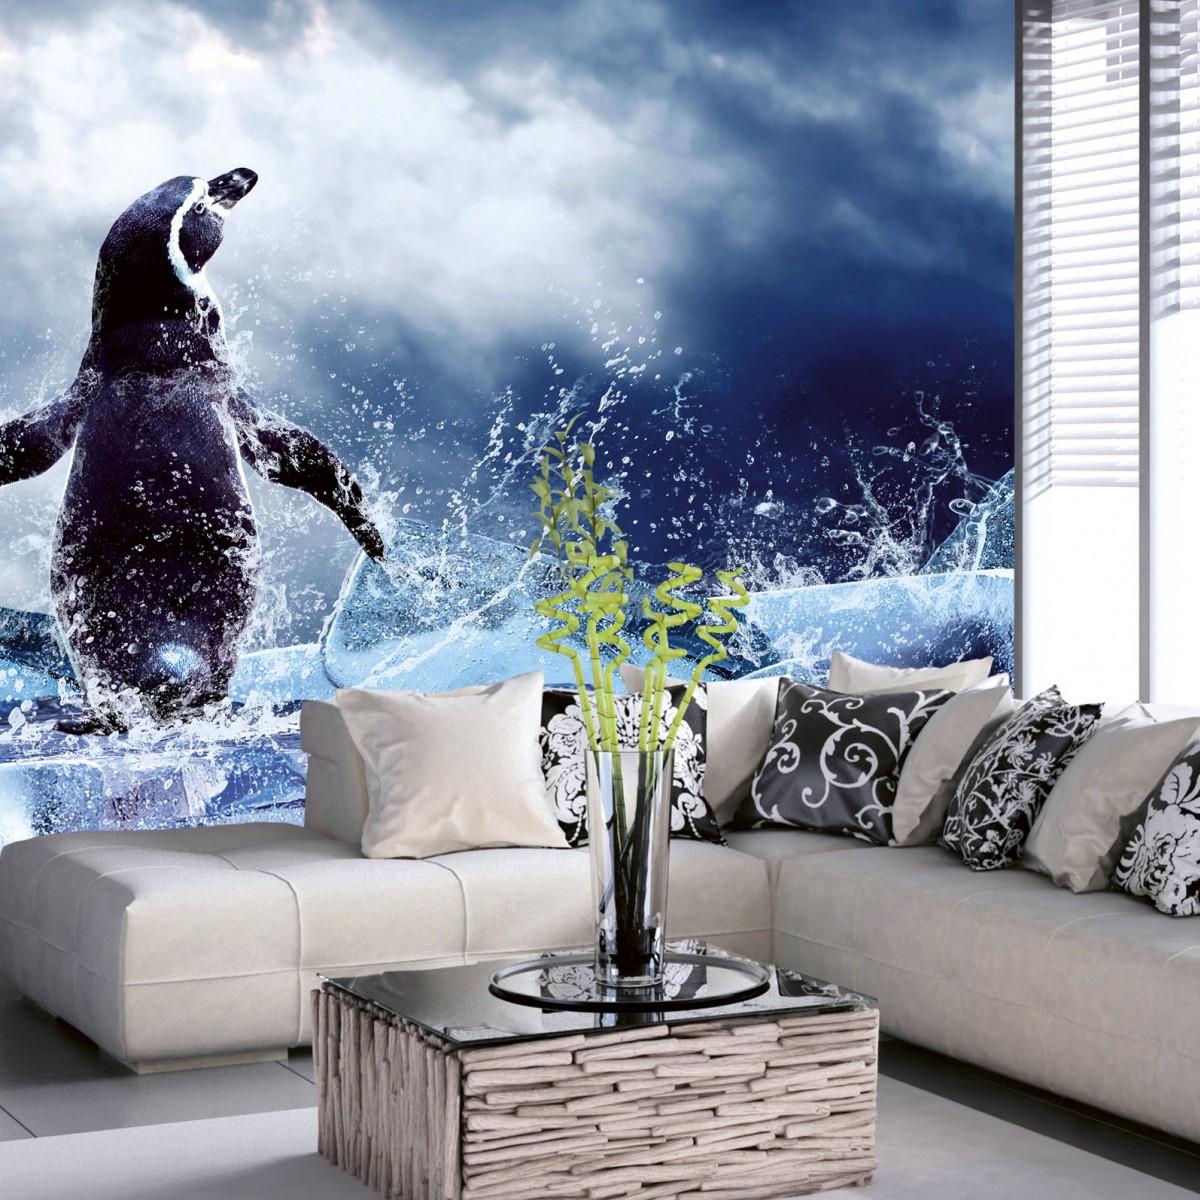 Foto tapet 3D Penguin, Dimex, 5 fâșii, 375 x 250cm